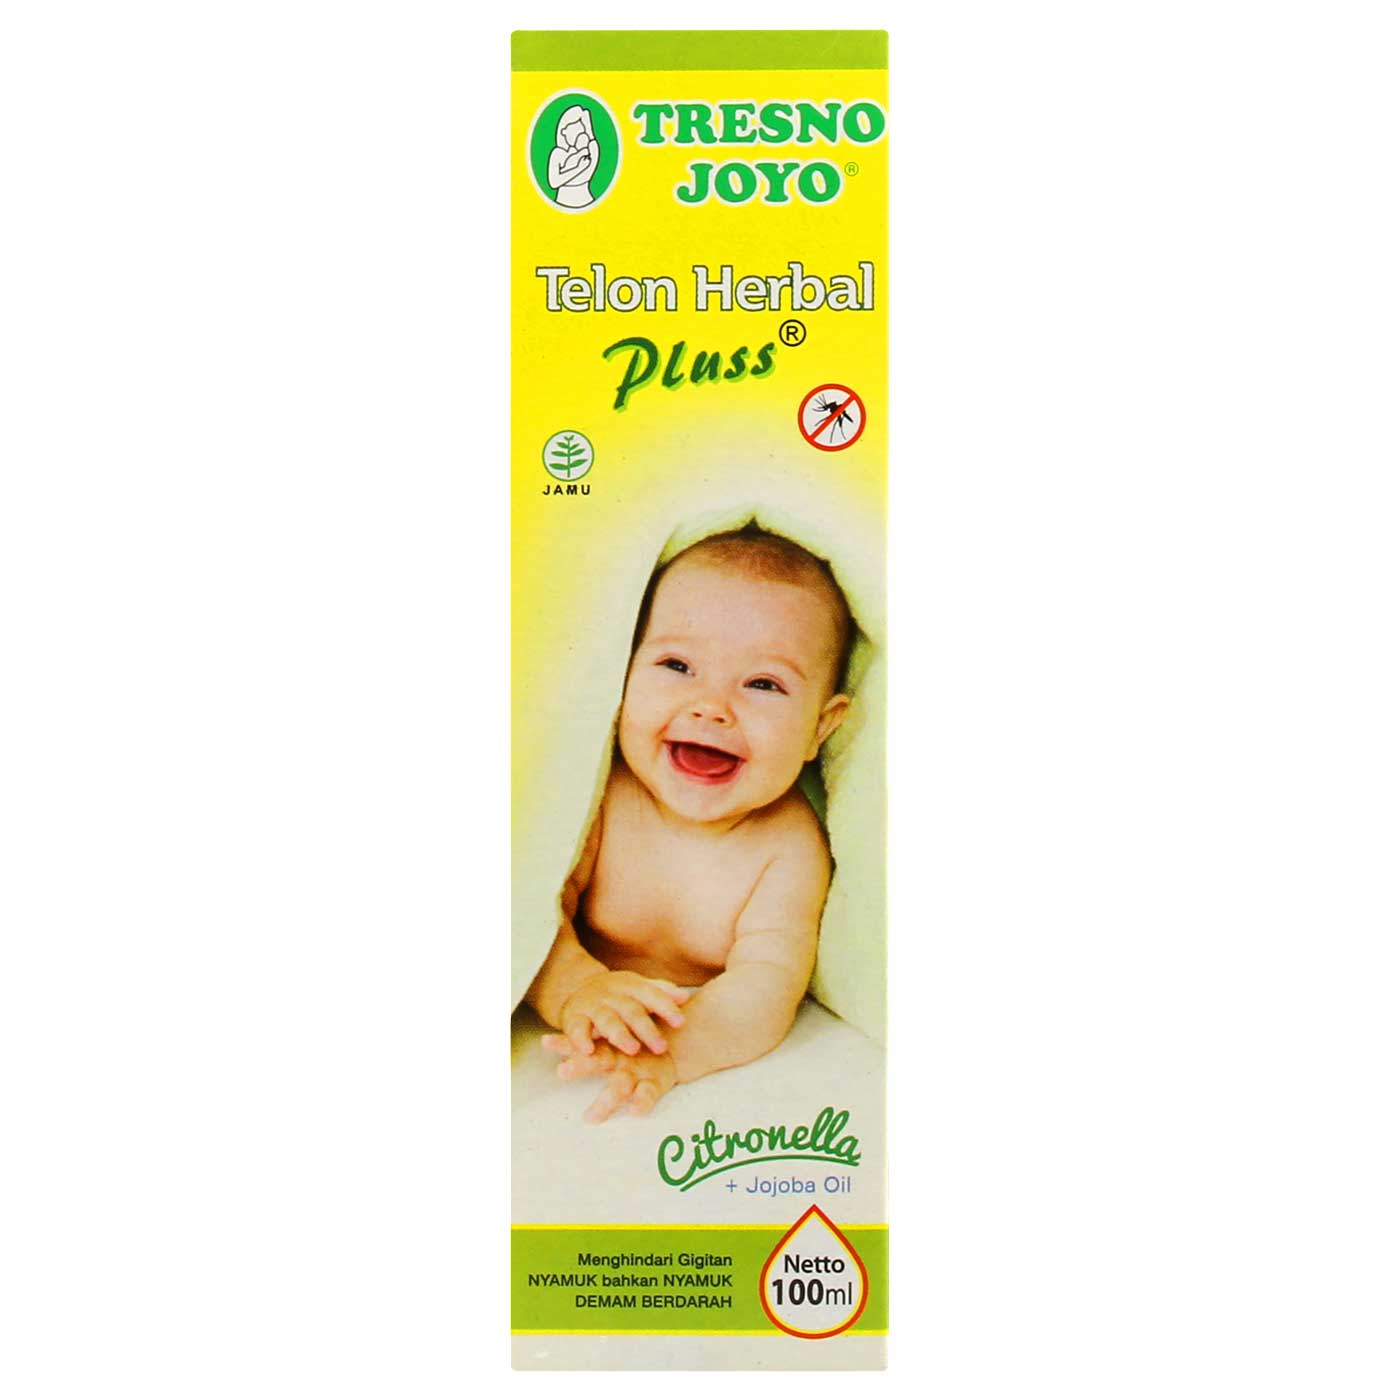 Tresno Joyo Minyak Telon Herbal Plus Citronella 100ml